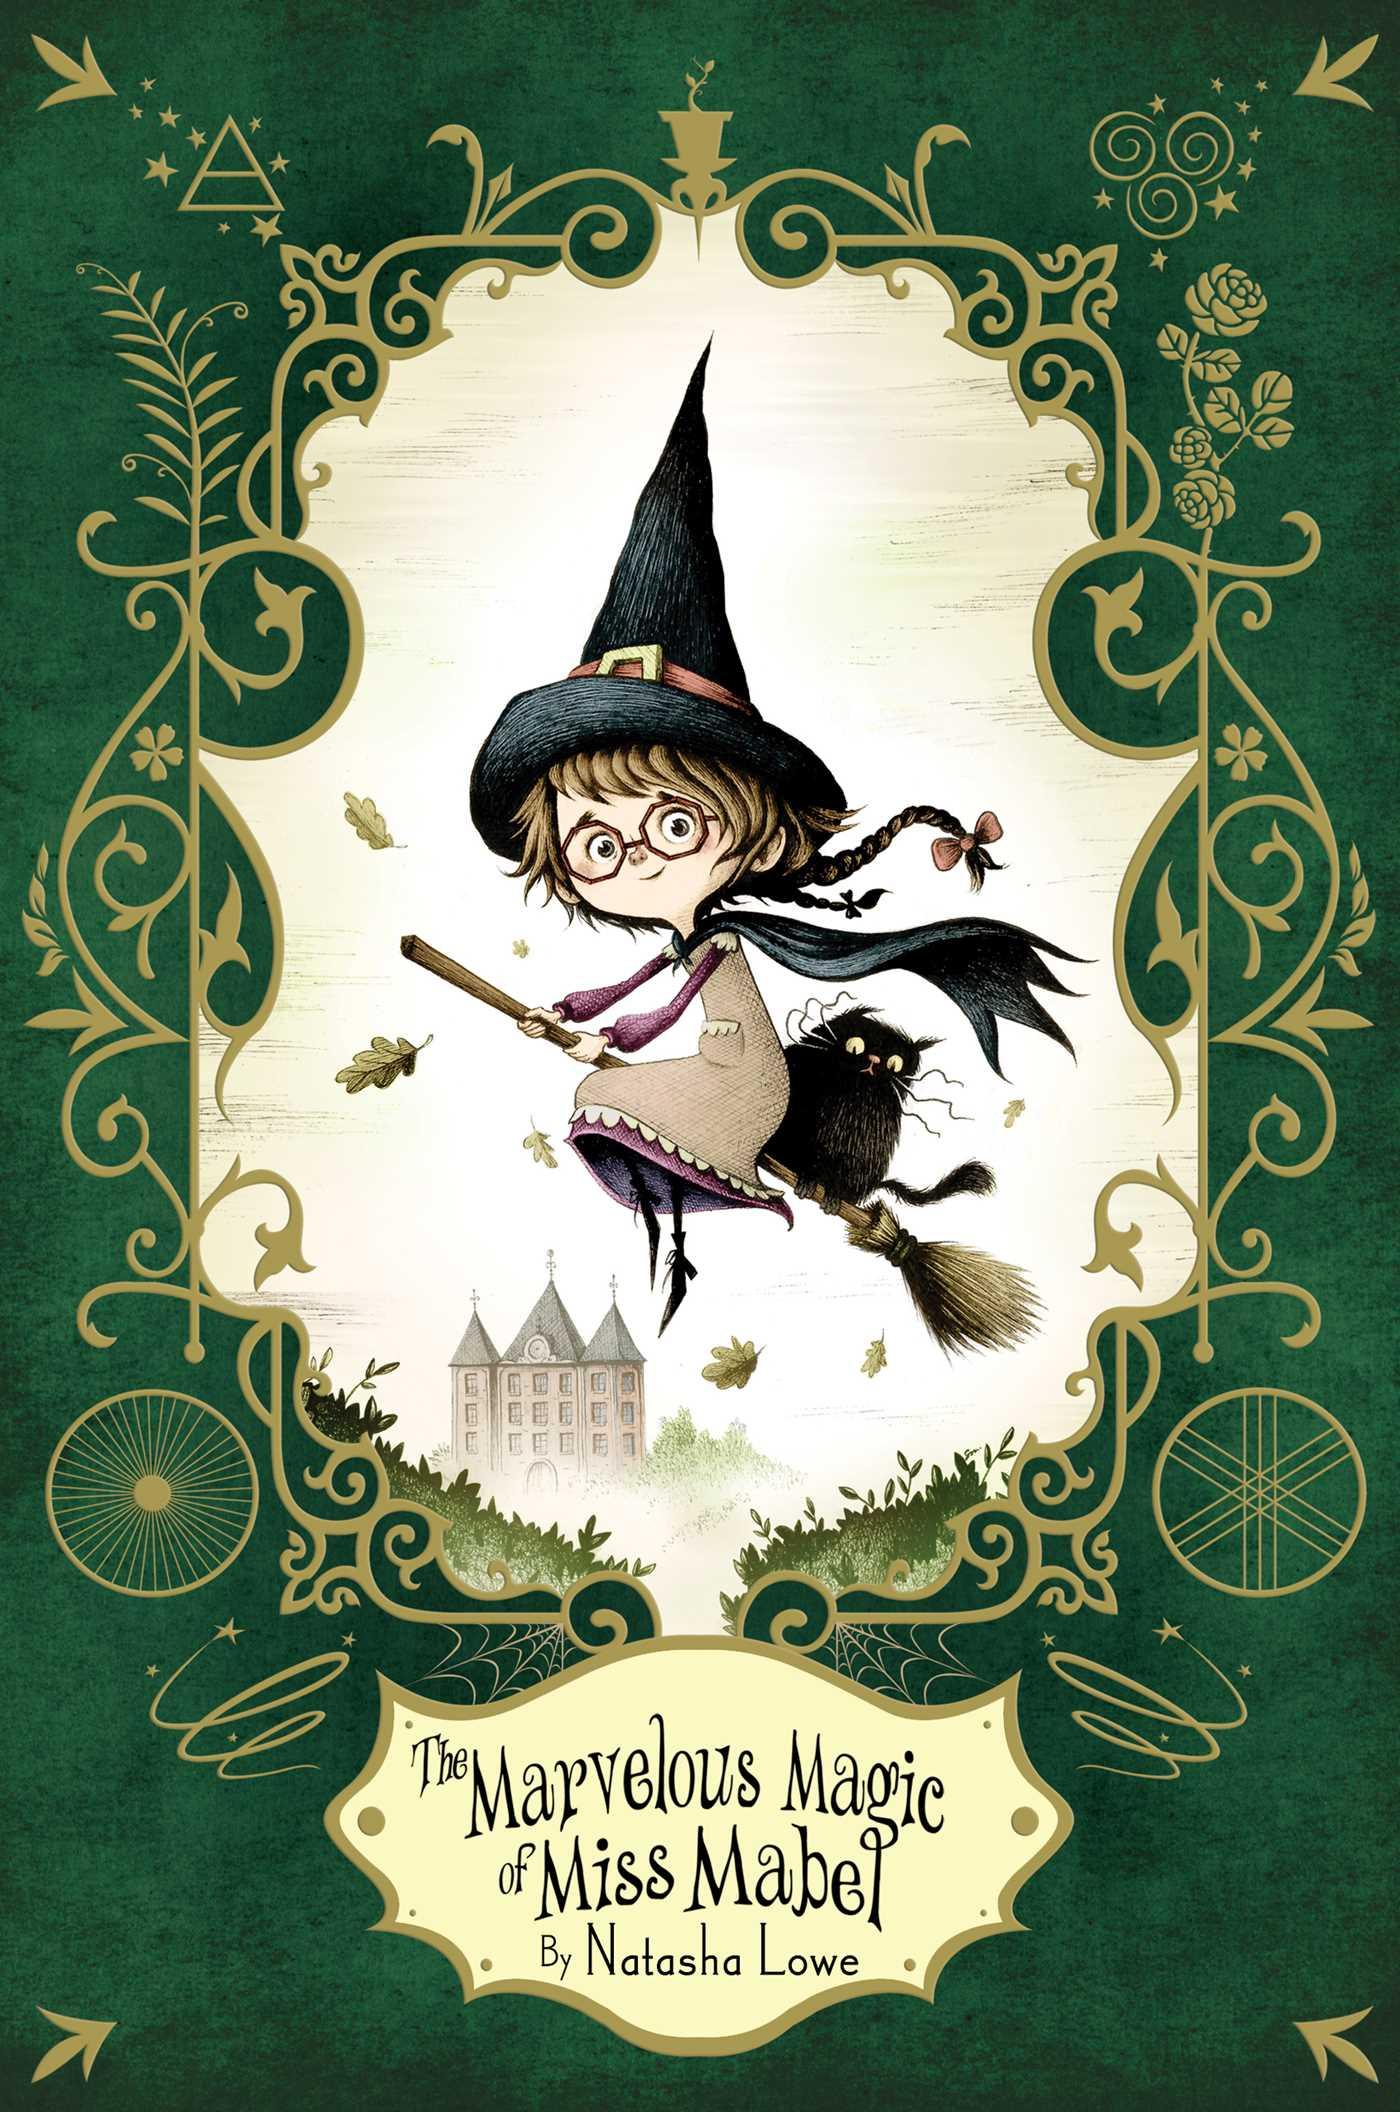 The Marvelous Magic of Miss Mabel eBook by Natasha Lowe